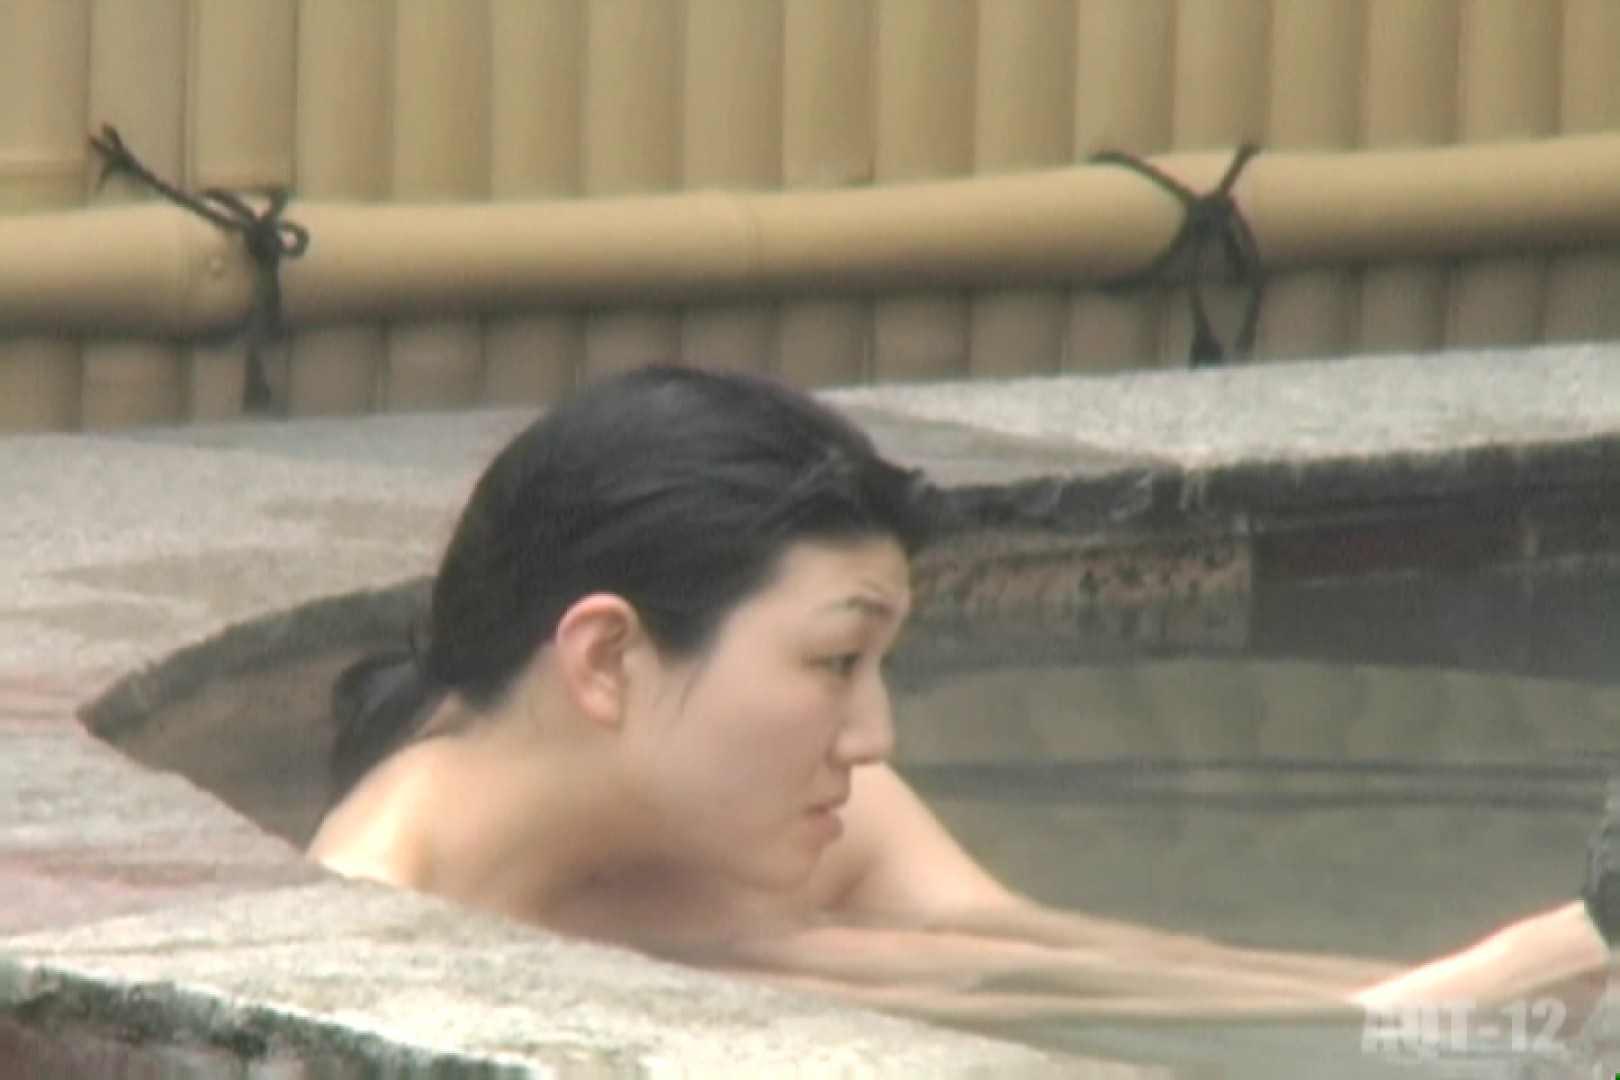 Aquaな露天風呂Vol.810 露天風呂編  108PIX 54